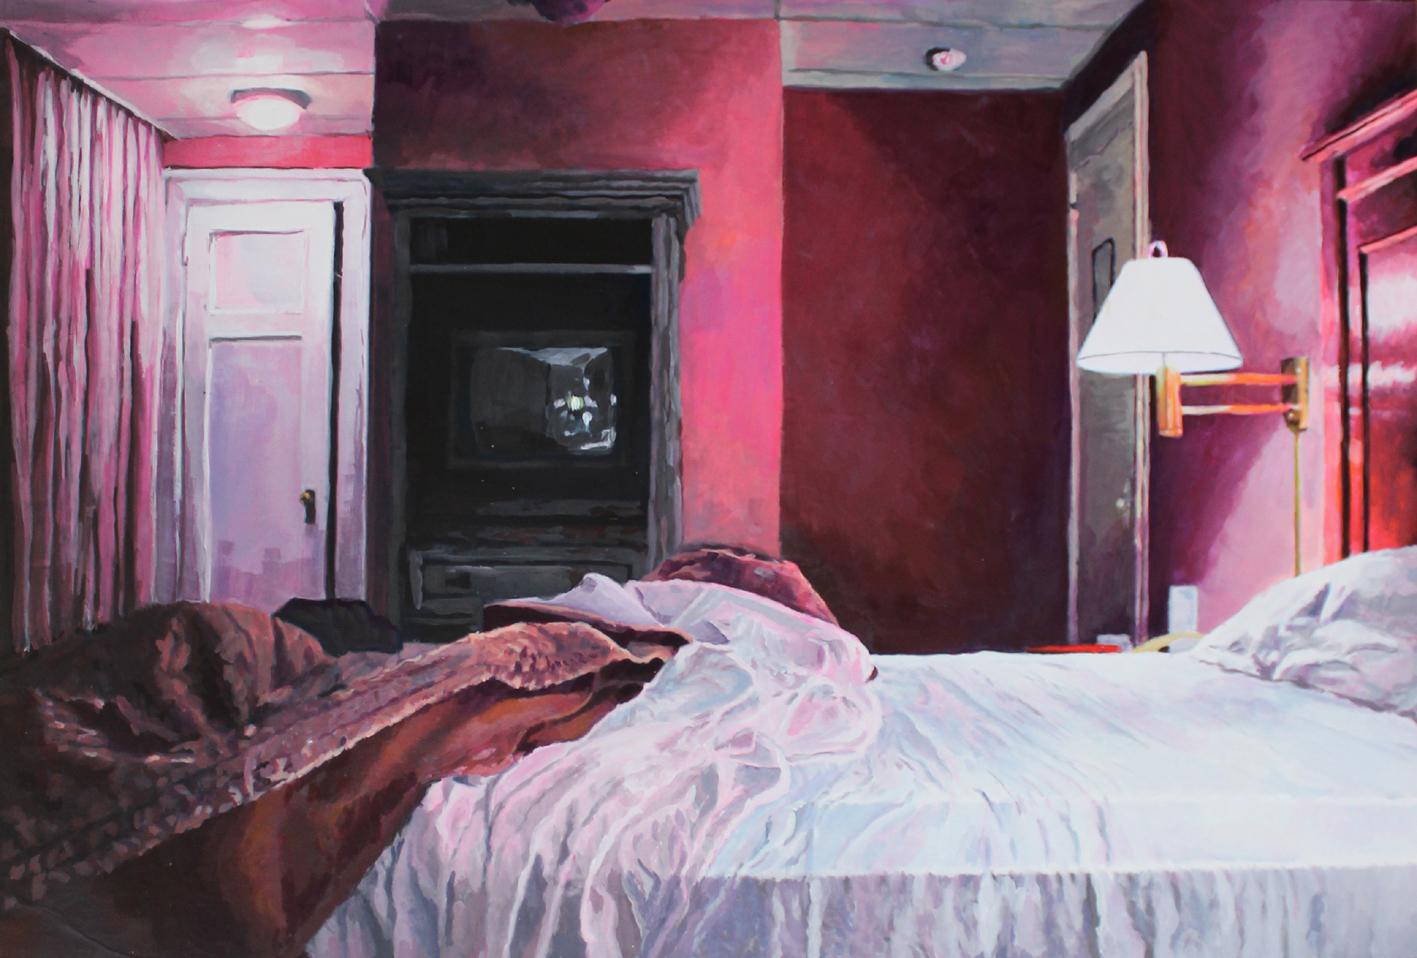 Julie Giraud, Pink room, peinture acrylique sur papier Fabriano, 87 x 59 cm